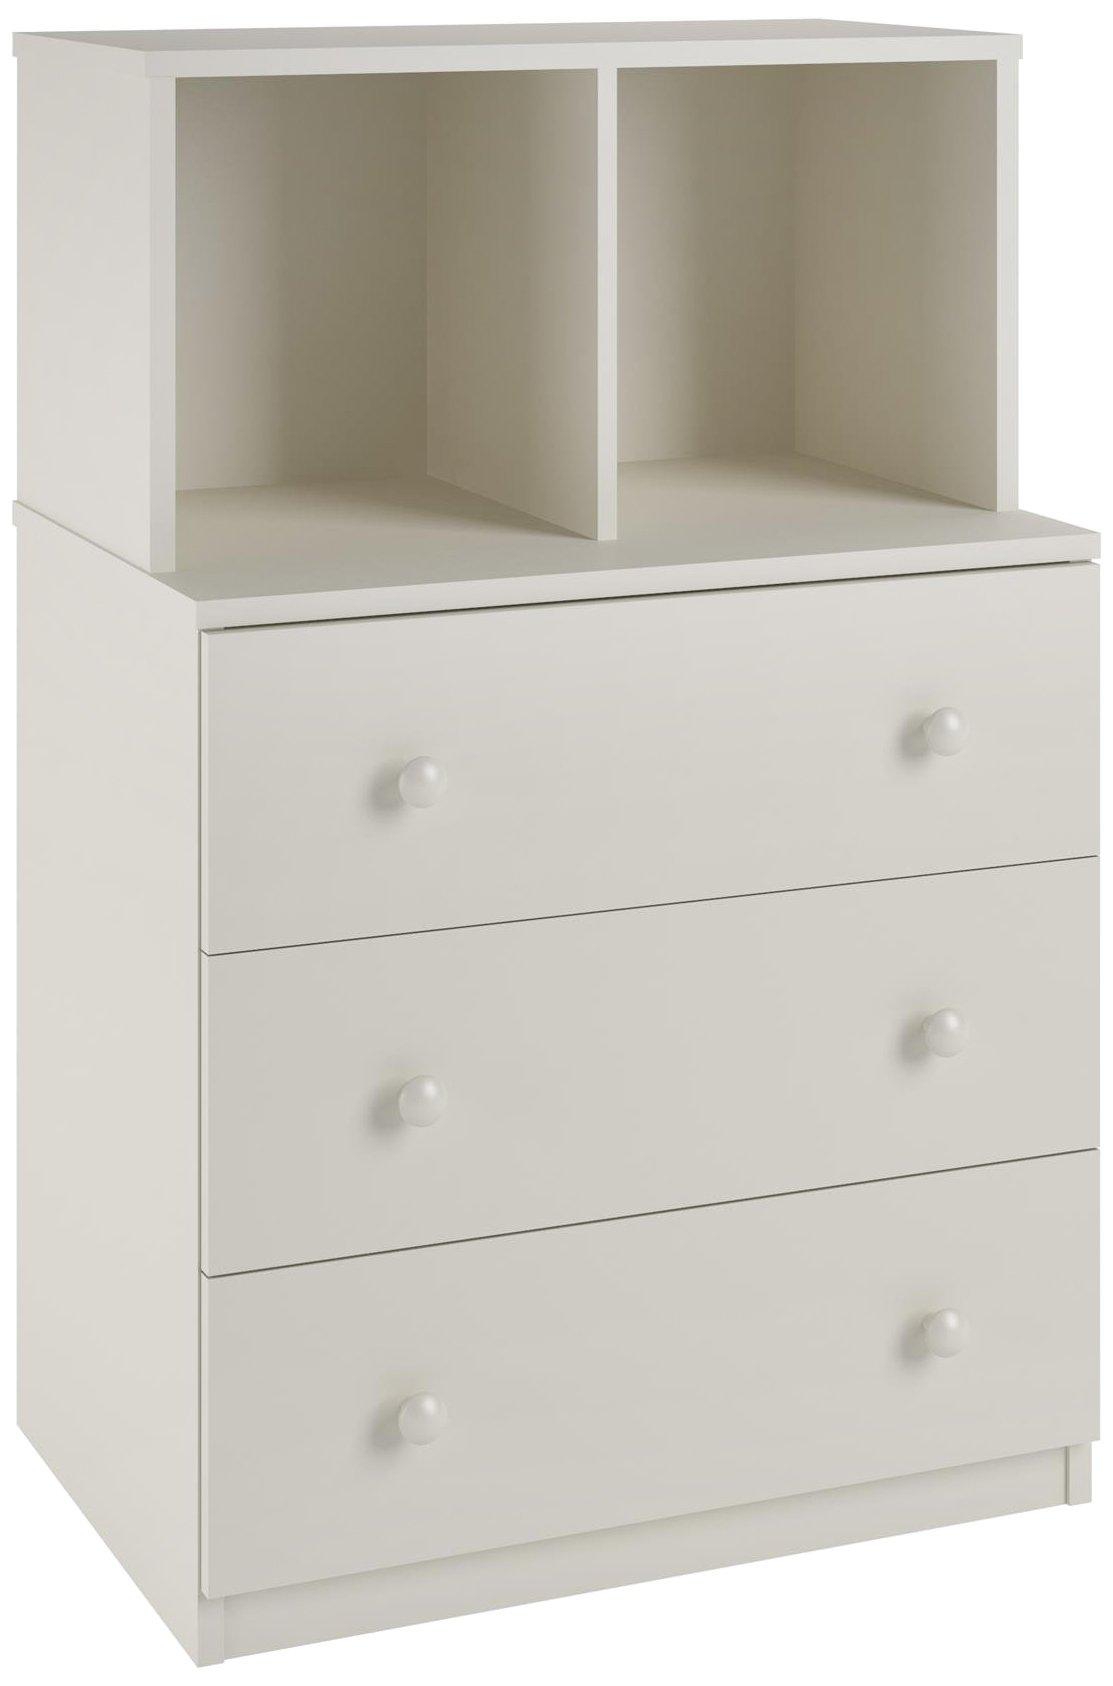 Ameriwood Home Skyler 3 Drawer Dresser with Cubbies, White